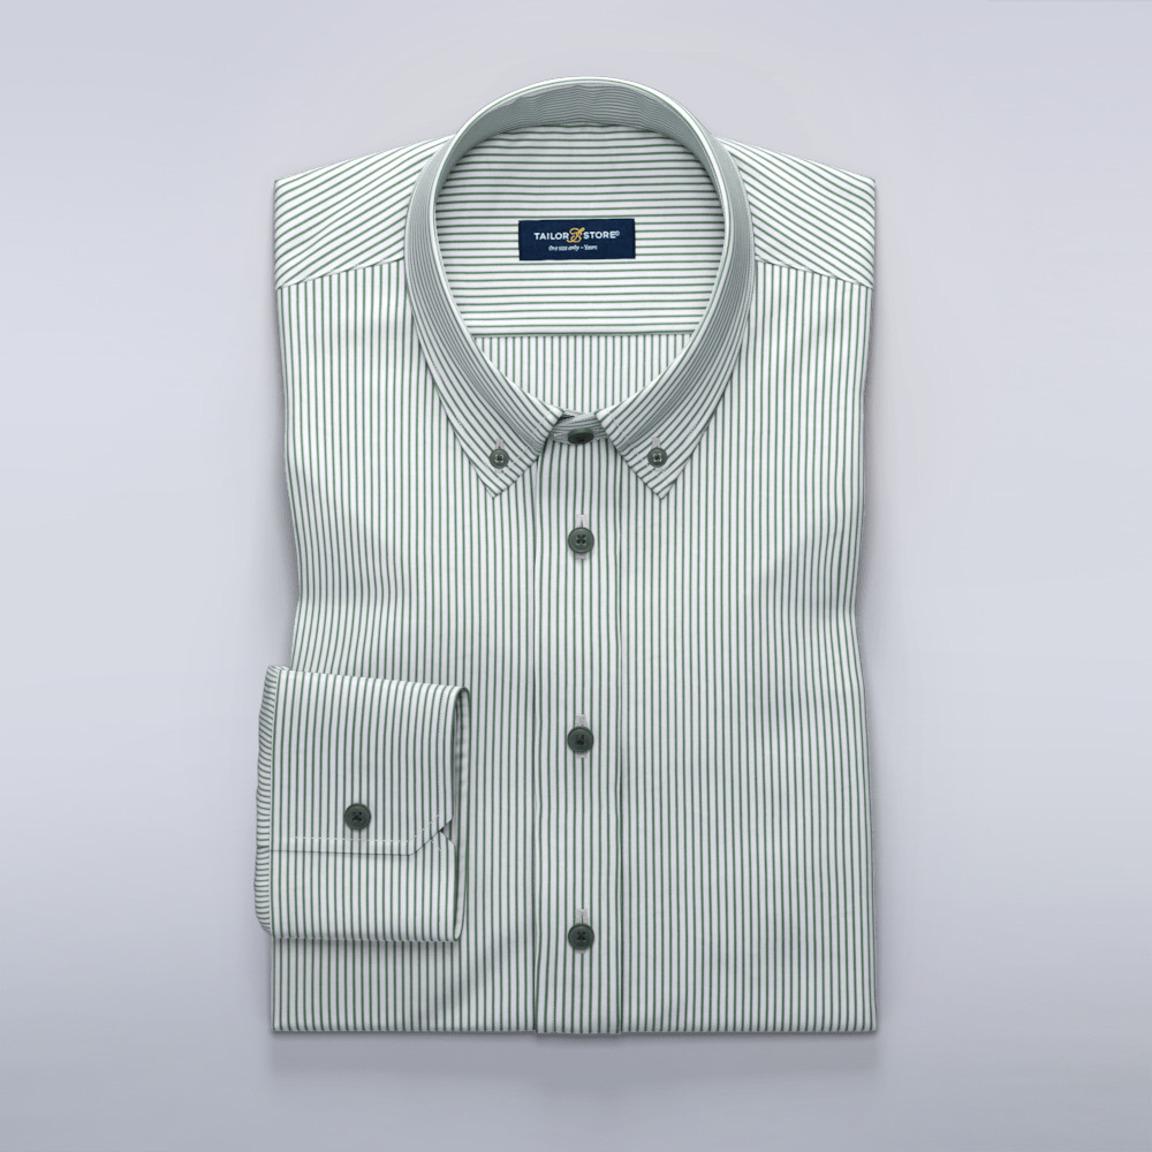 Grün gestreiftes Business-Hemd mit seidigem Finish